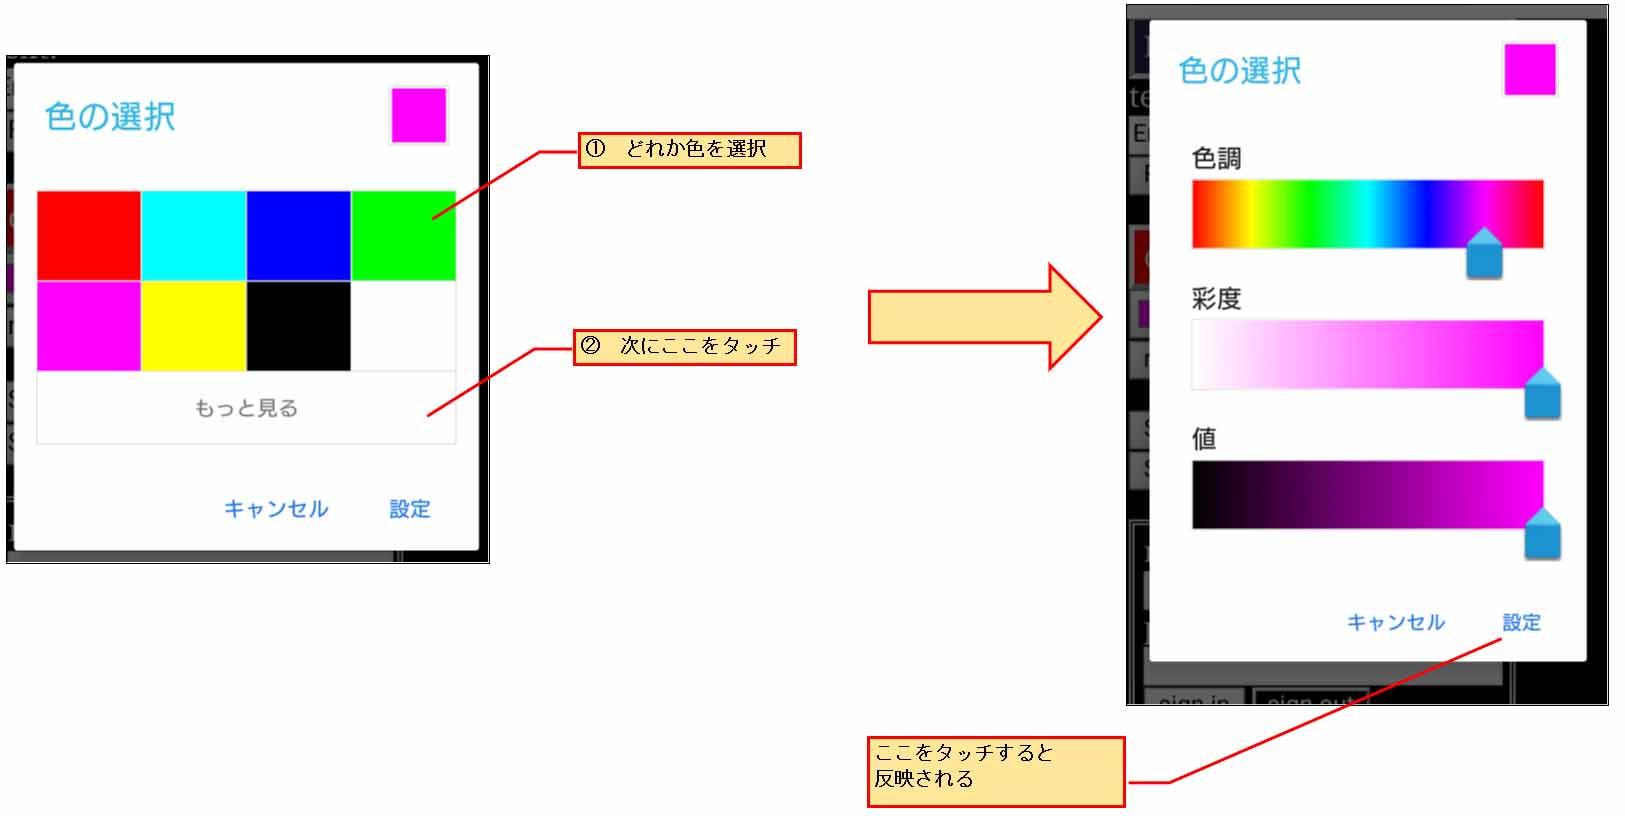 firebase_esp32_m5stack_smapho04.jpg